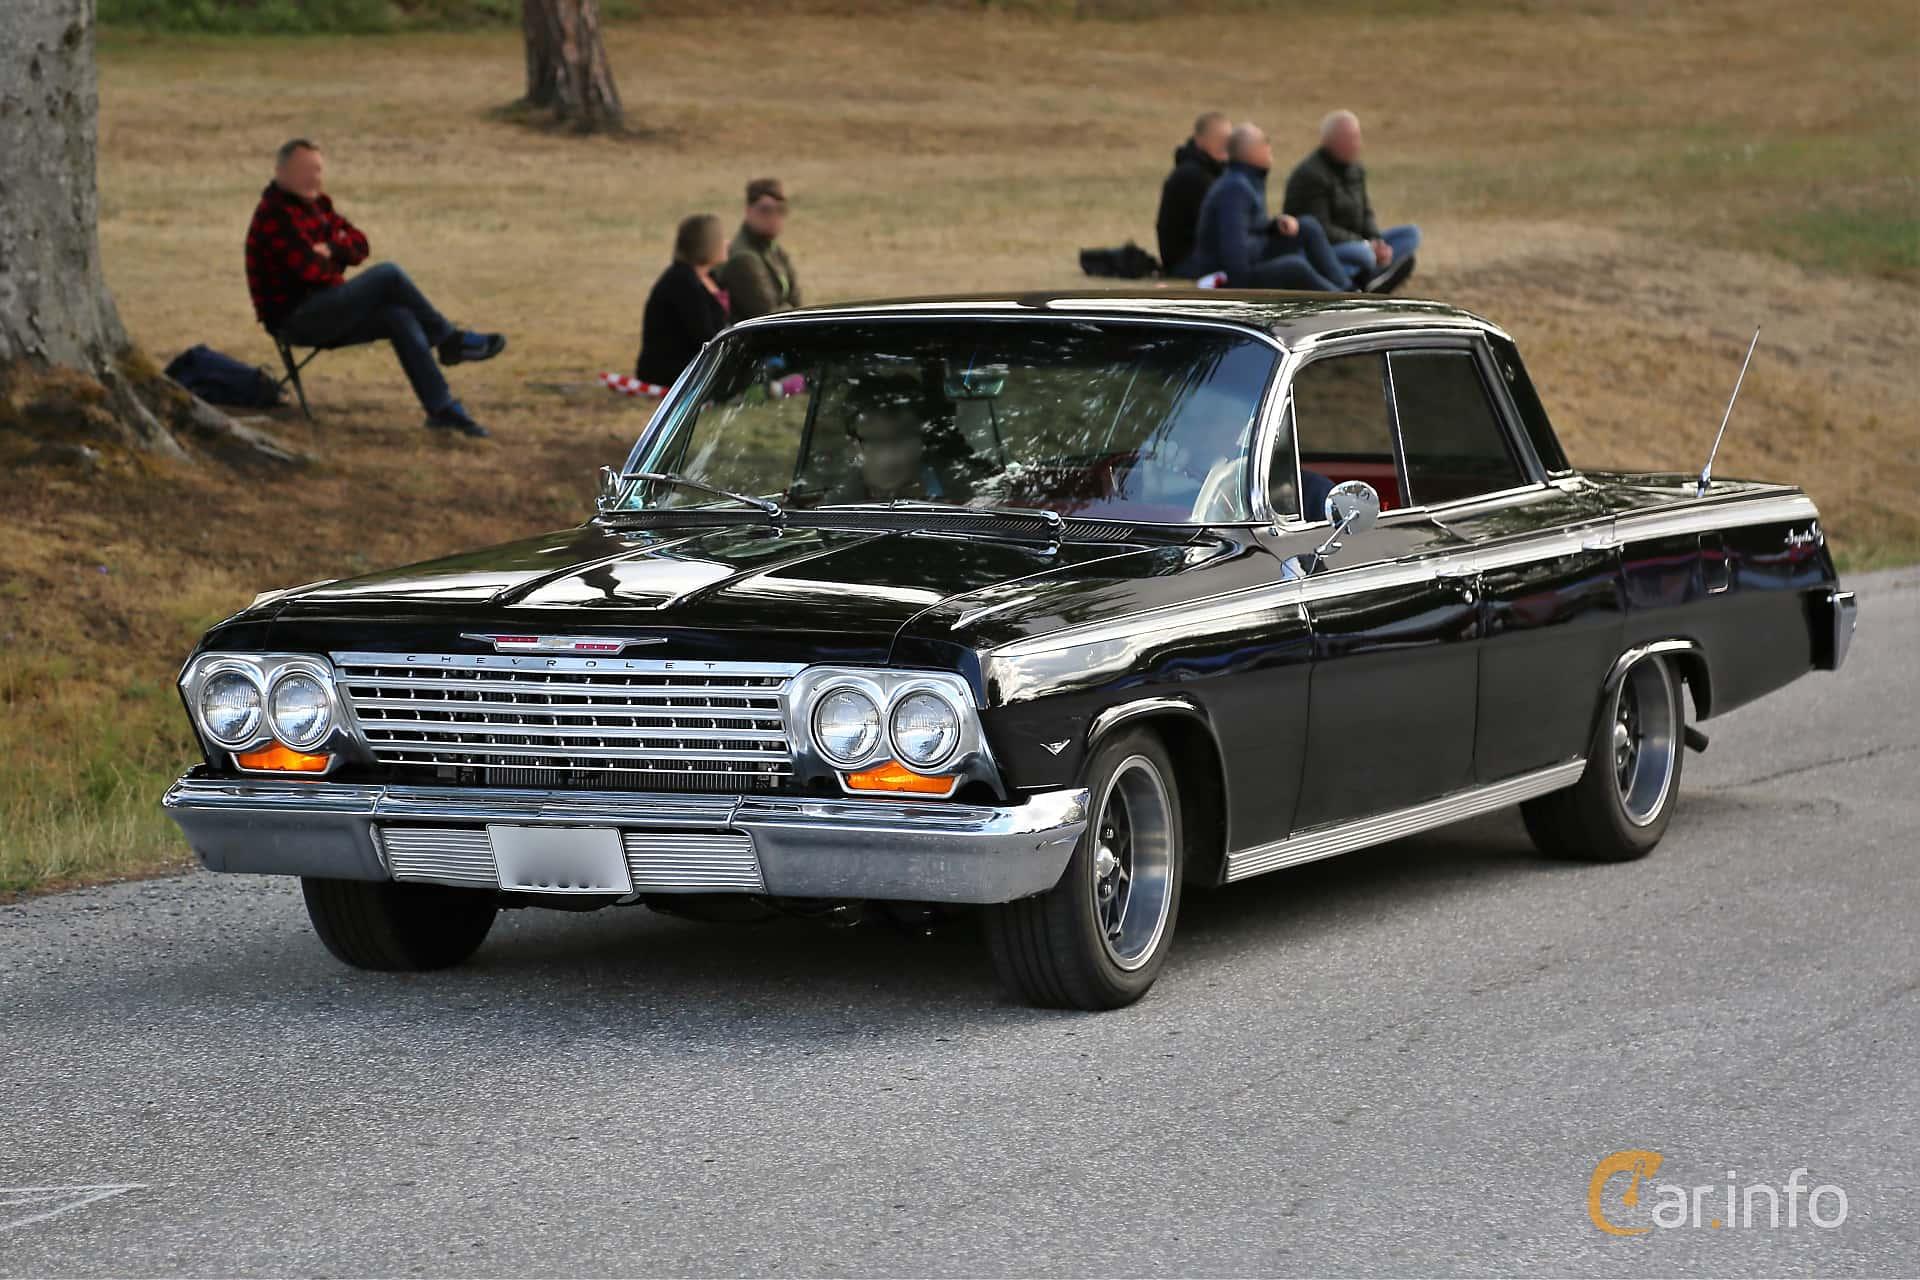 Topworldauto Photos Of Chevrolet Impala Sport Sedan Photo Galleries